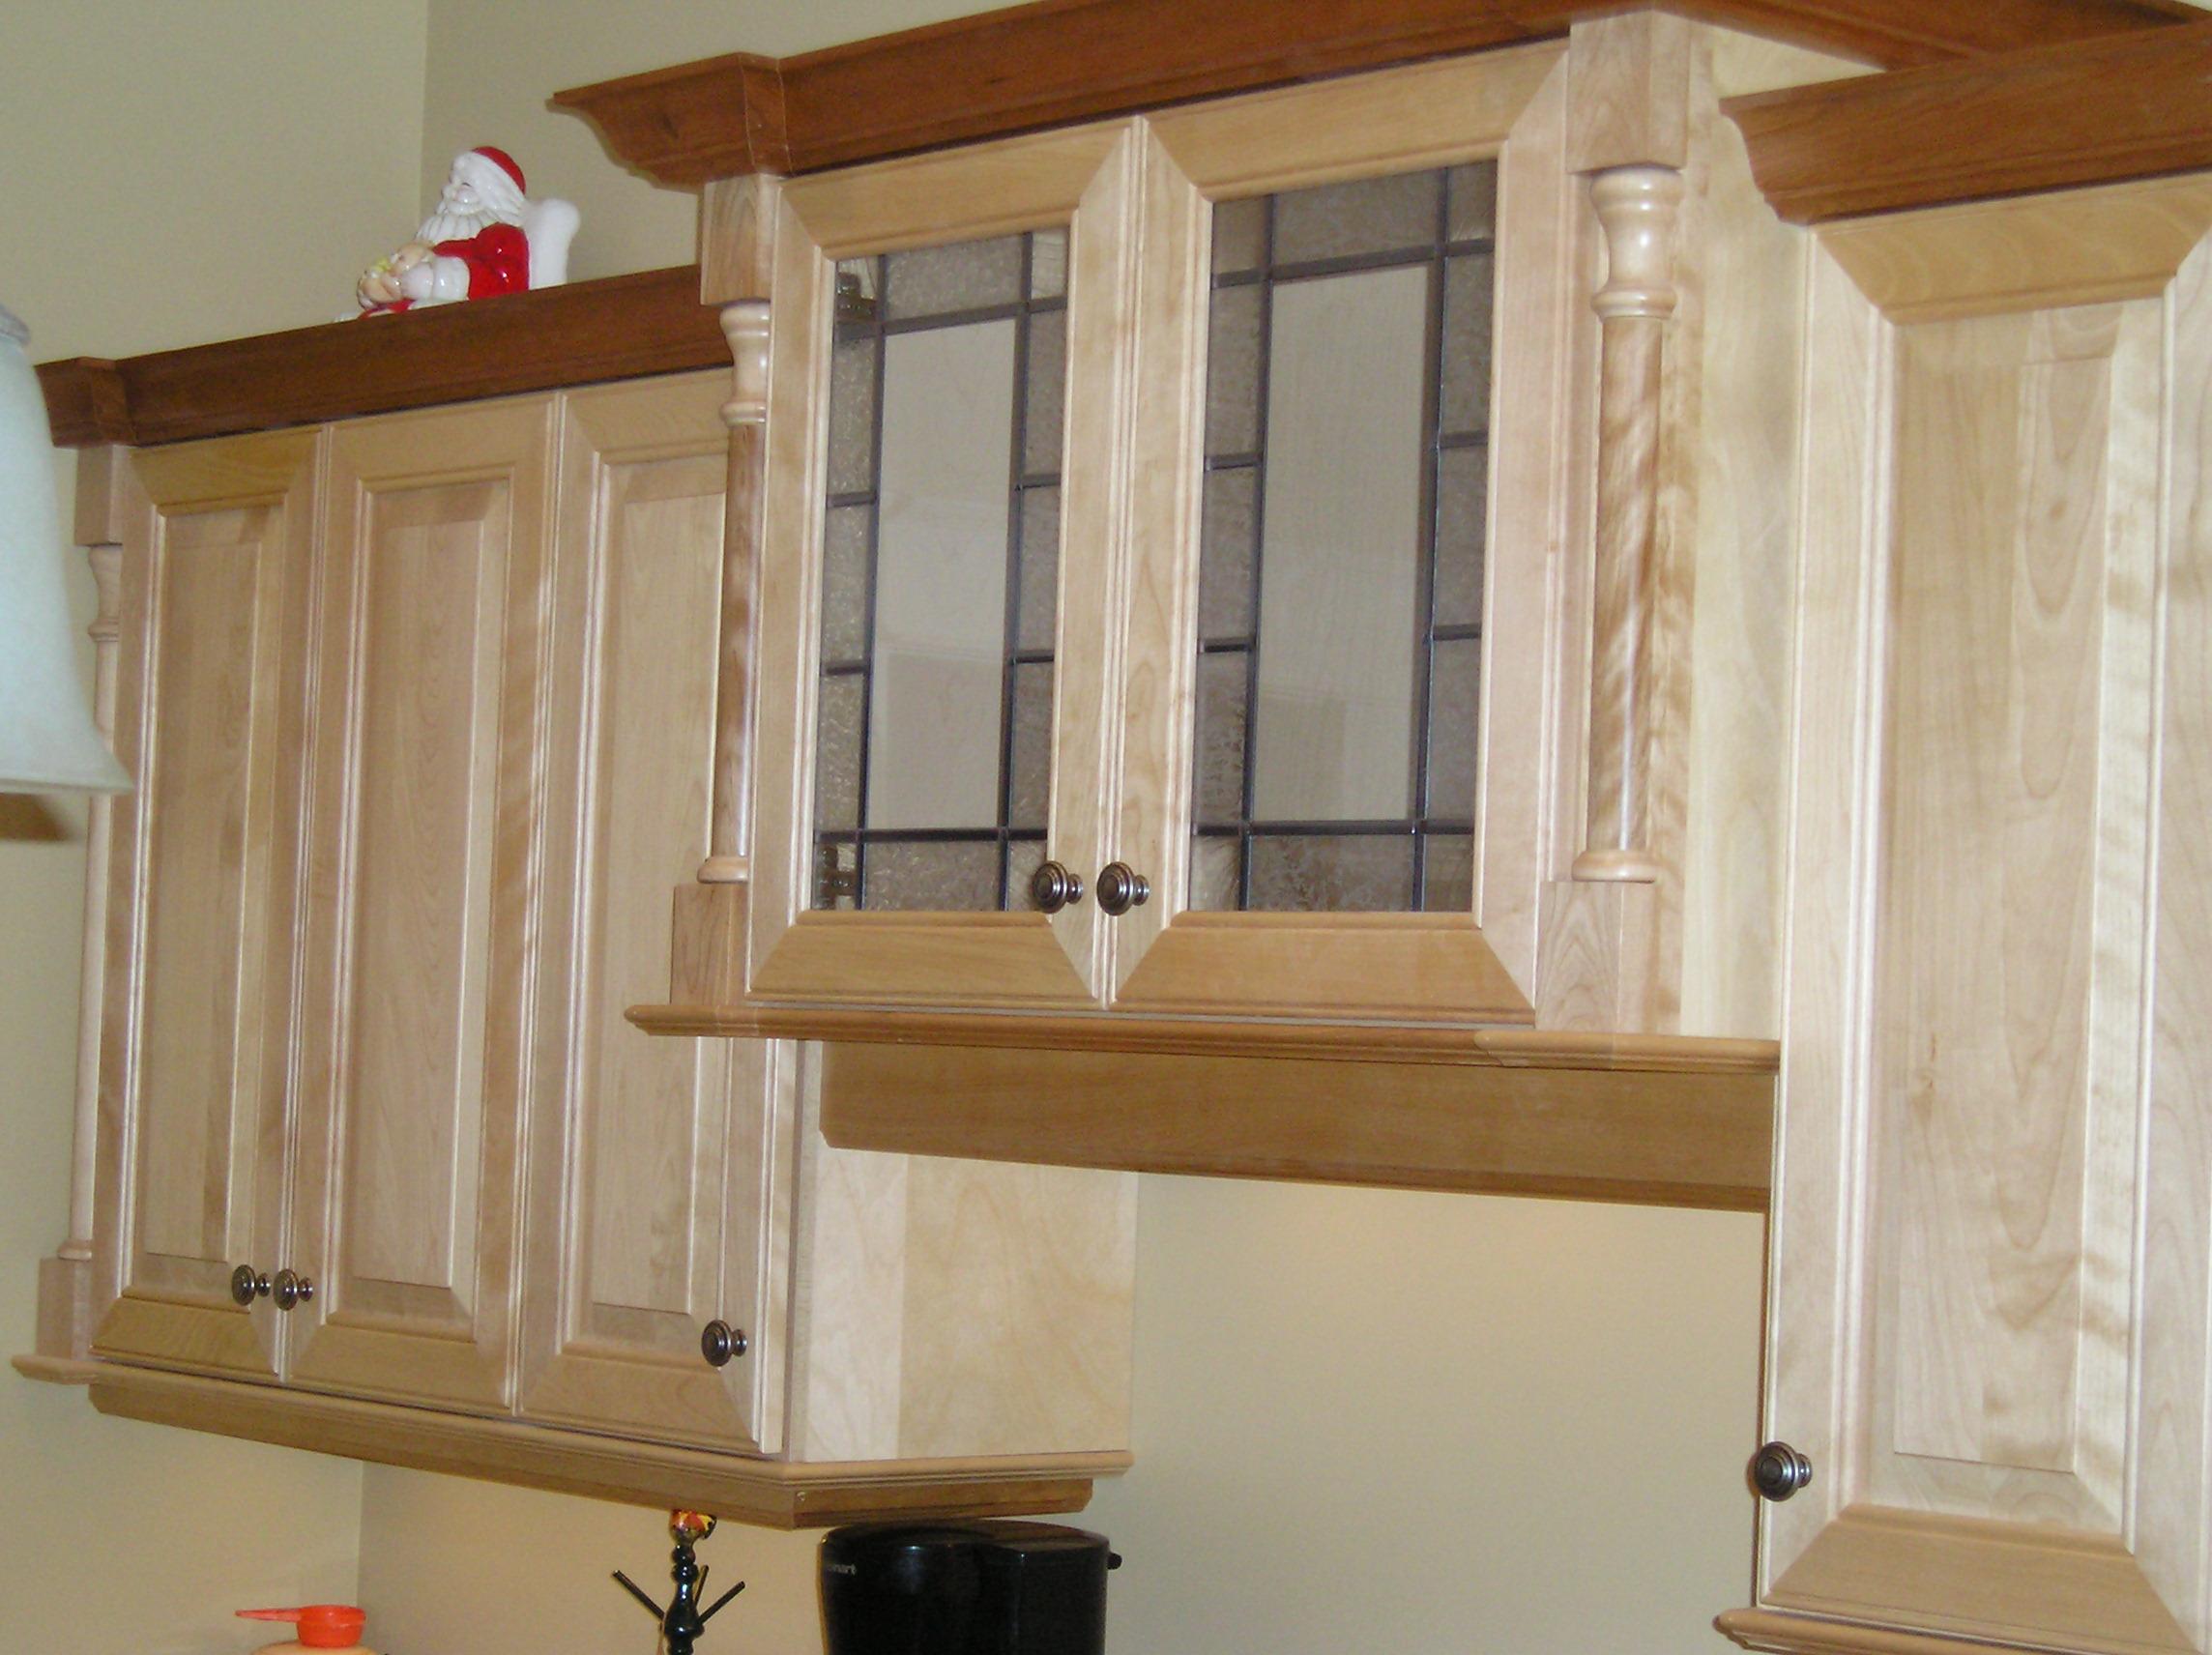 cabinets (10).jpg